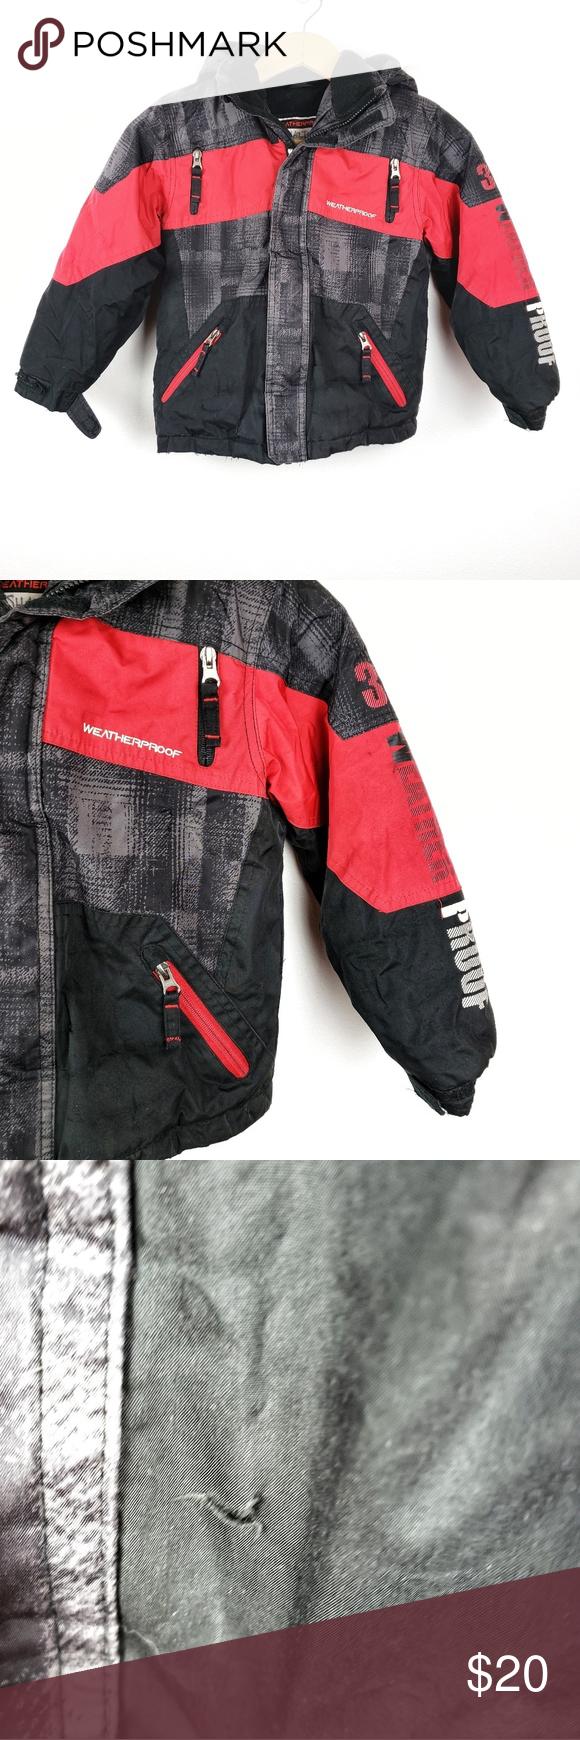 Weatherproof Boys Snow Winter Coat Jacket Size 6 Winter Coats Jackets Winter Coat Winter Coat Snow [ 1740 x 580 Pixel ]